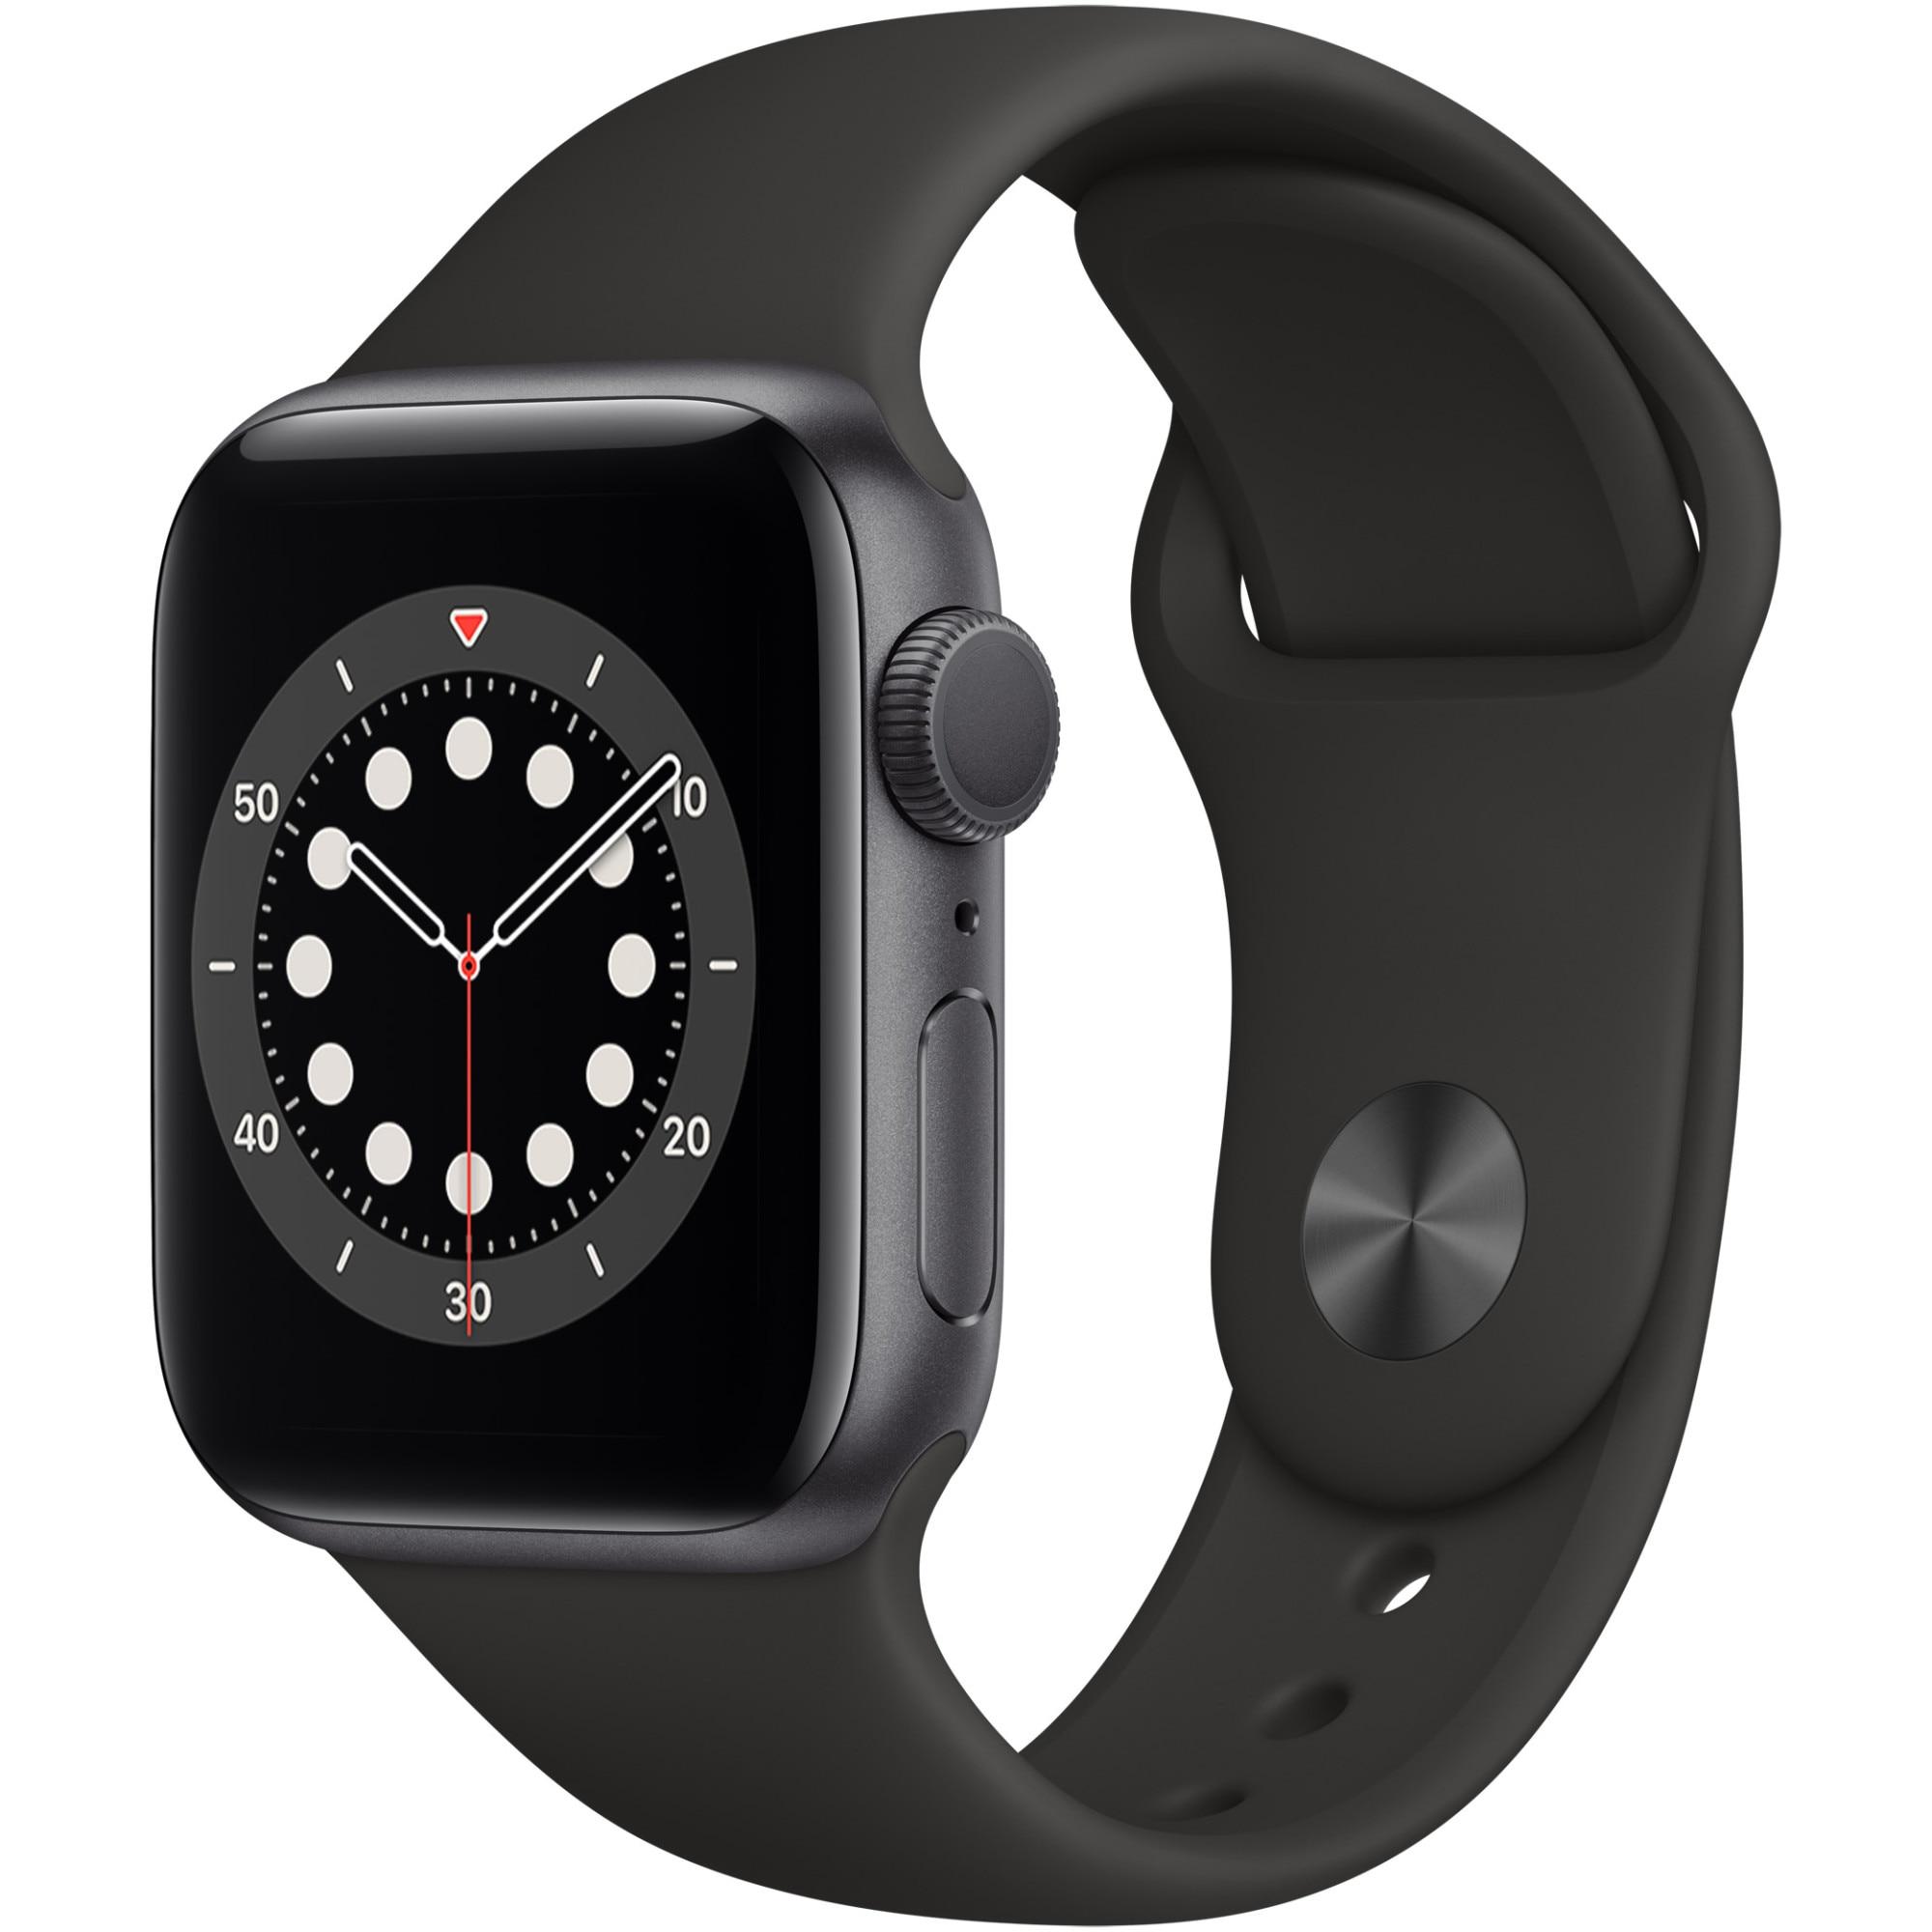 Fotografie Apple Watch 6, GPS, Carcasa Space Gray Aluminium 40mm, Black Sport Band